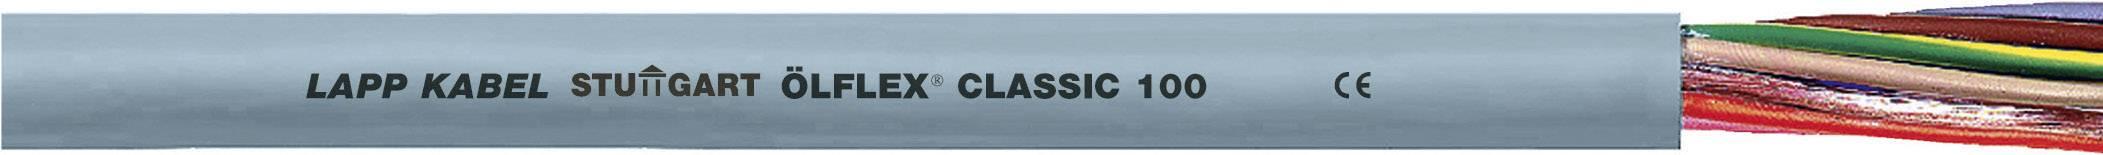 Kabel LappKabel Ölflex CLASSIC 100 5G0,5 (00100034), PVC, 6,2 mm, 500 V, šedá, 50 m